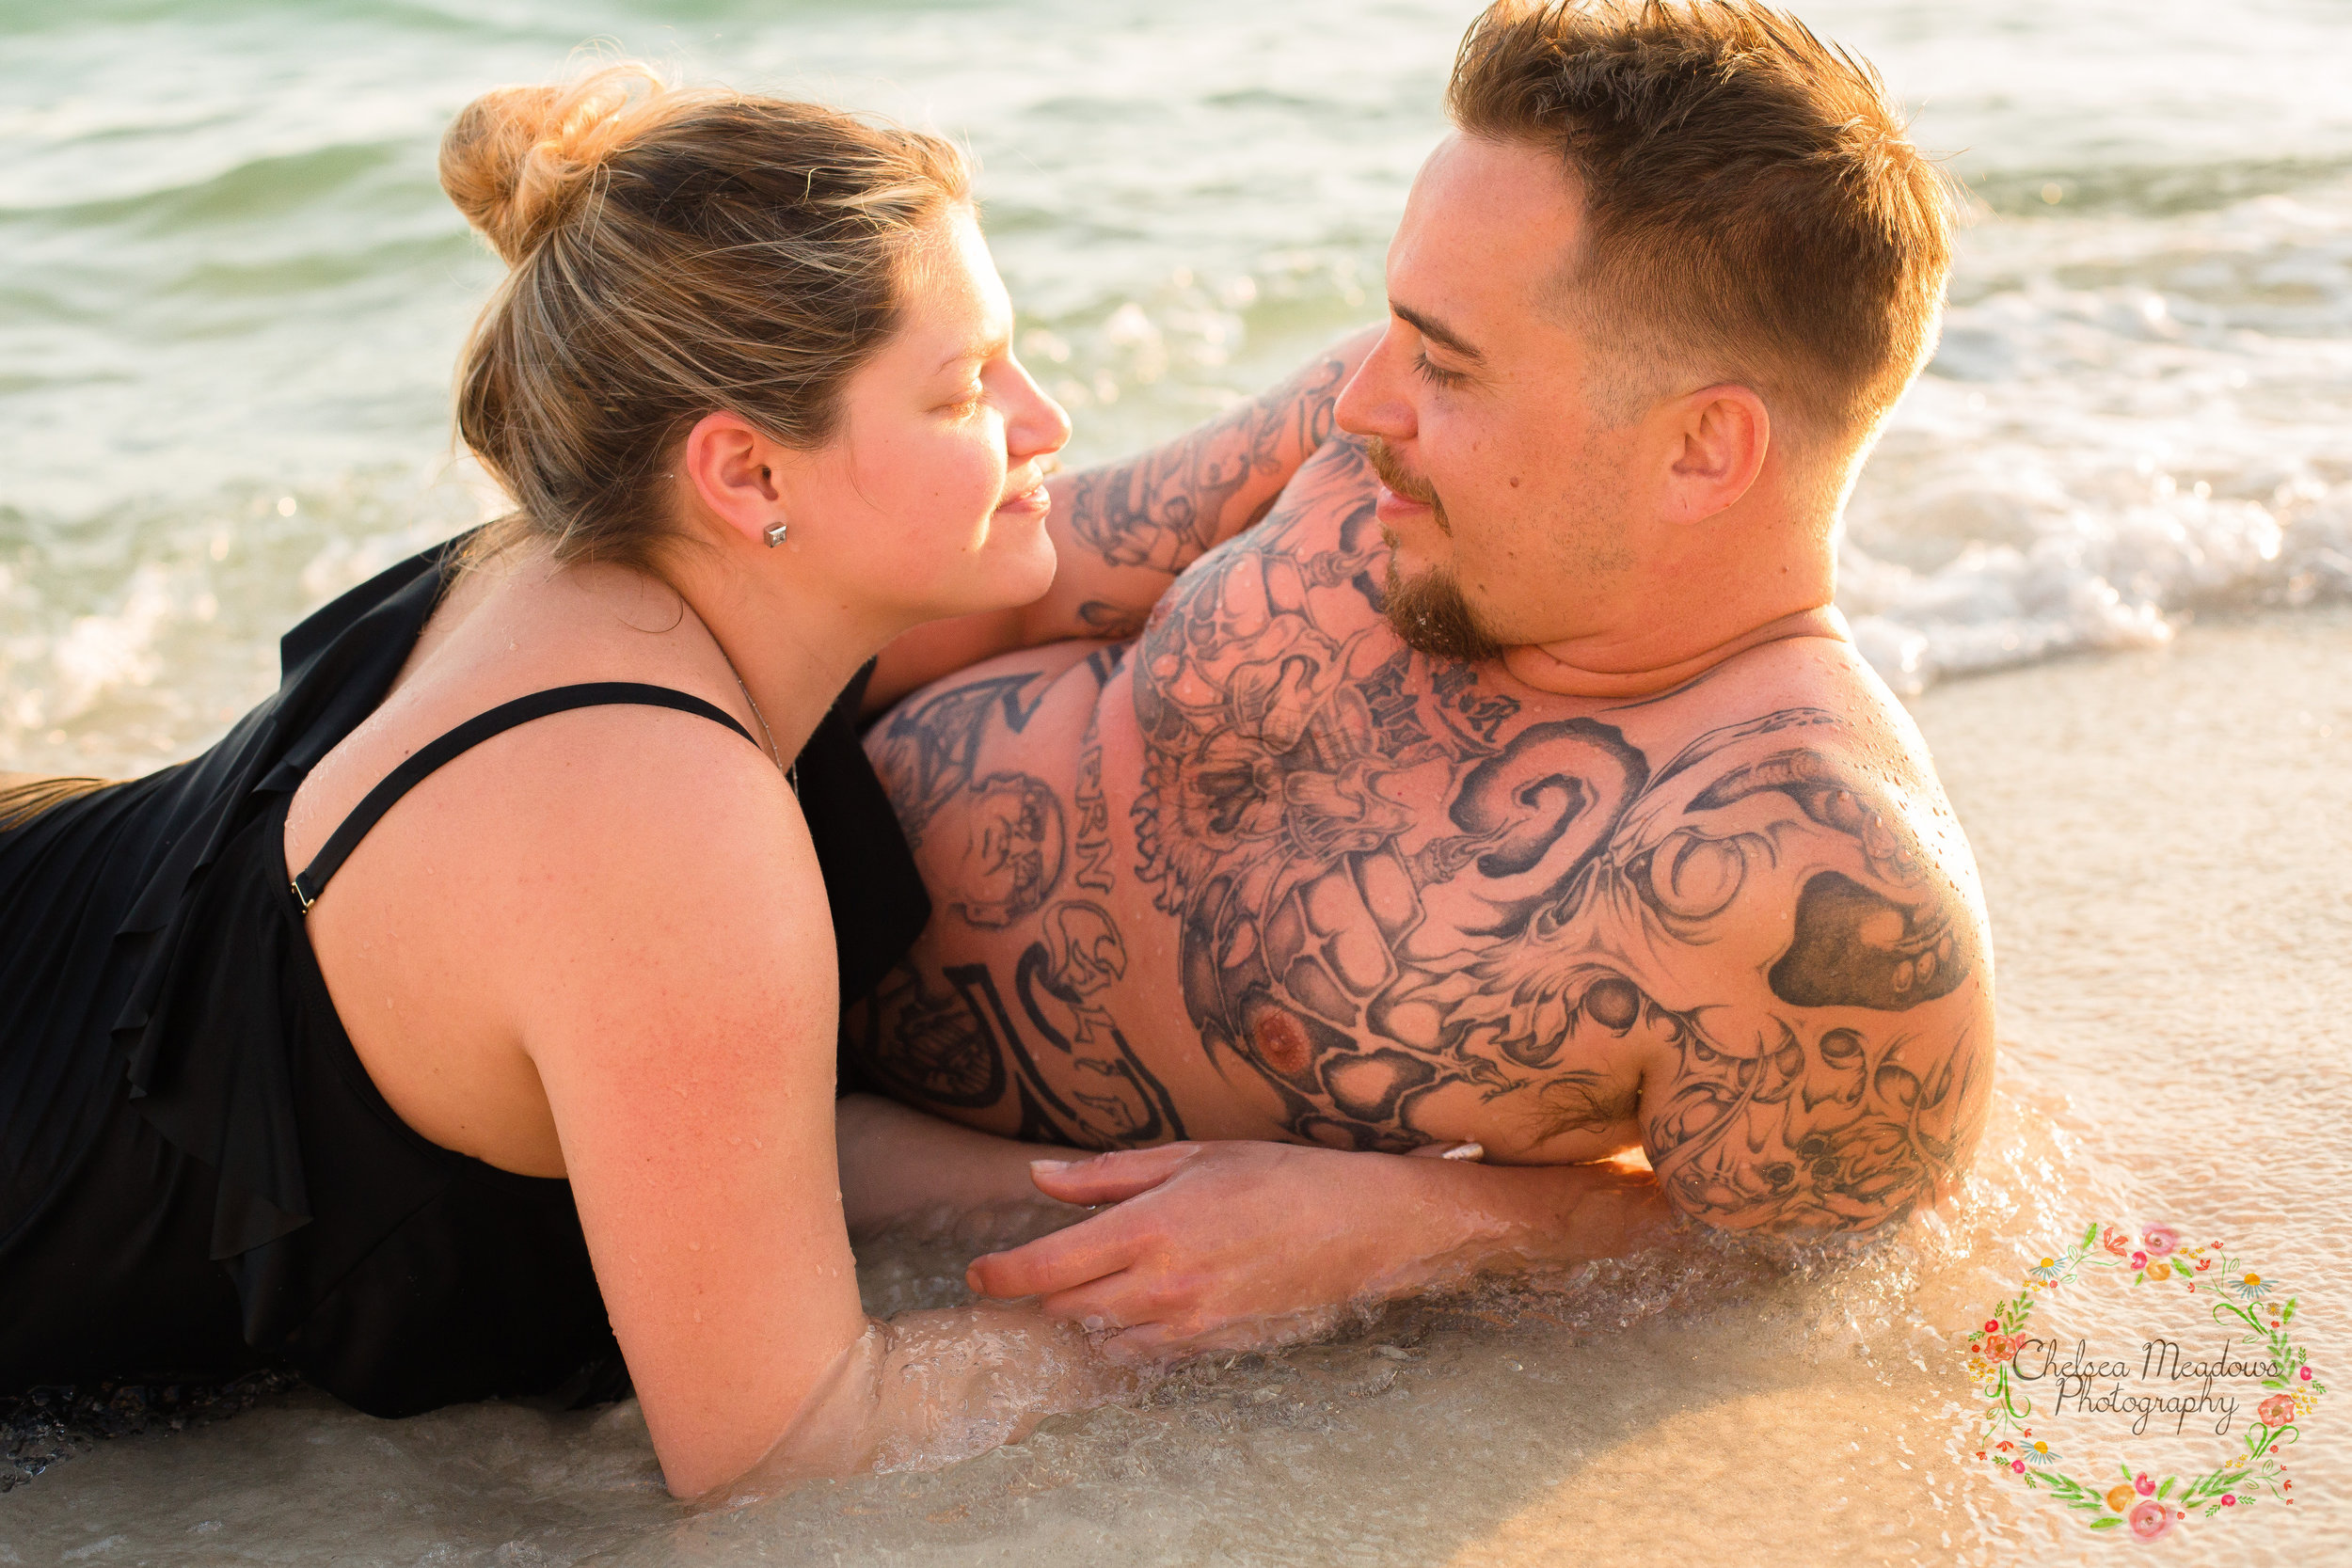 Nicole & Drew Beach Maternity - Nashville Maternity Photography - Chelsea Meadows Photography (81).jpg